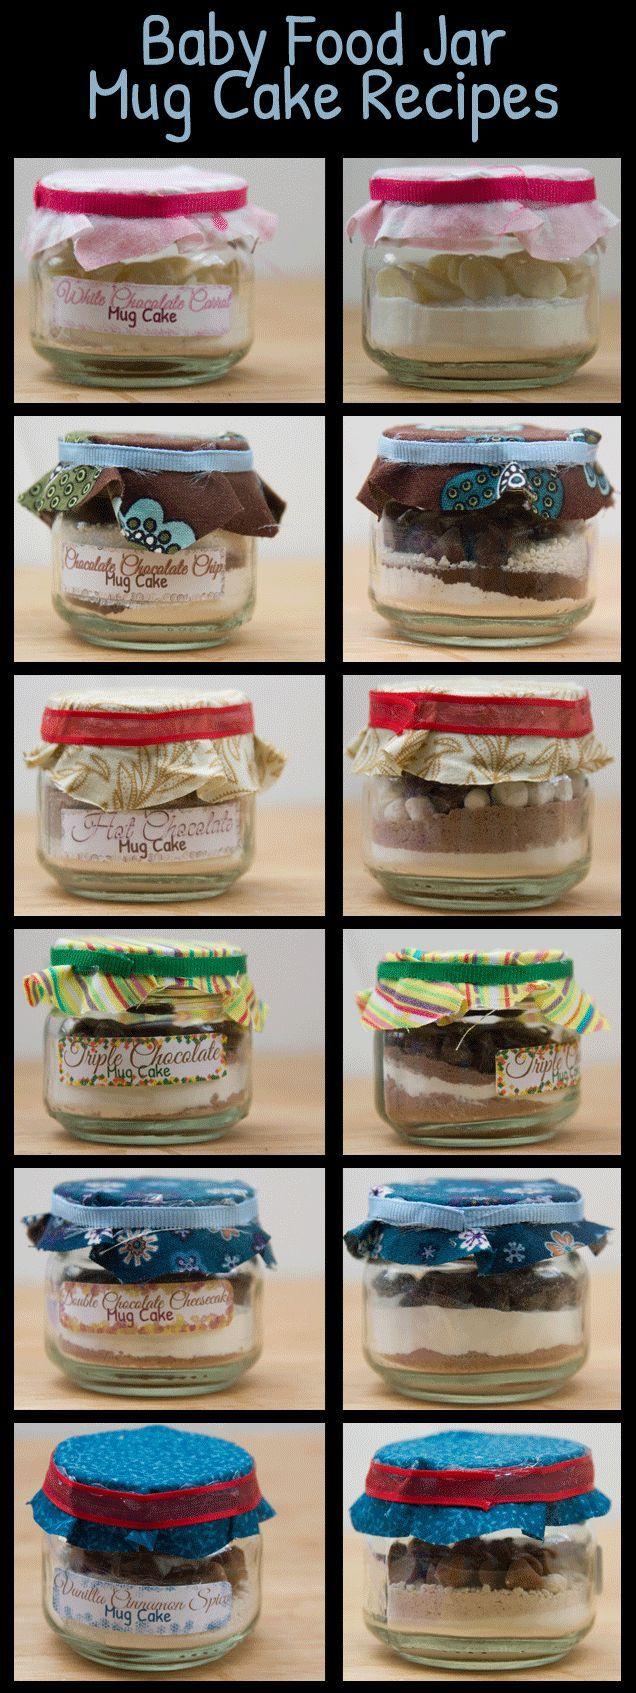 Baby Food Jar Mug Cake Recipes And Gift Basket